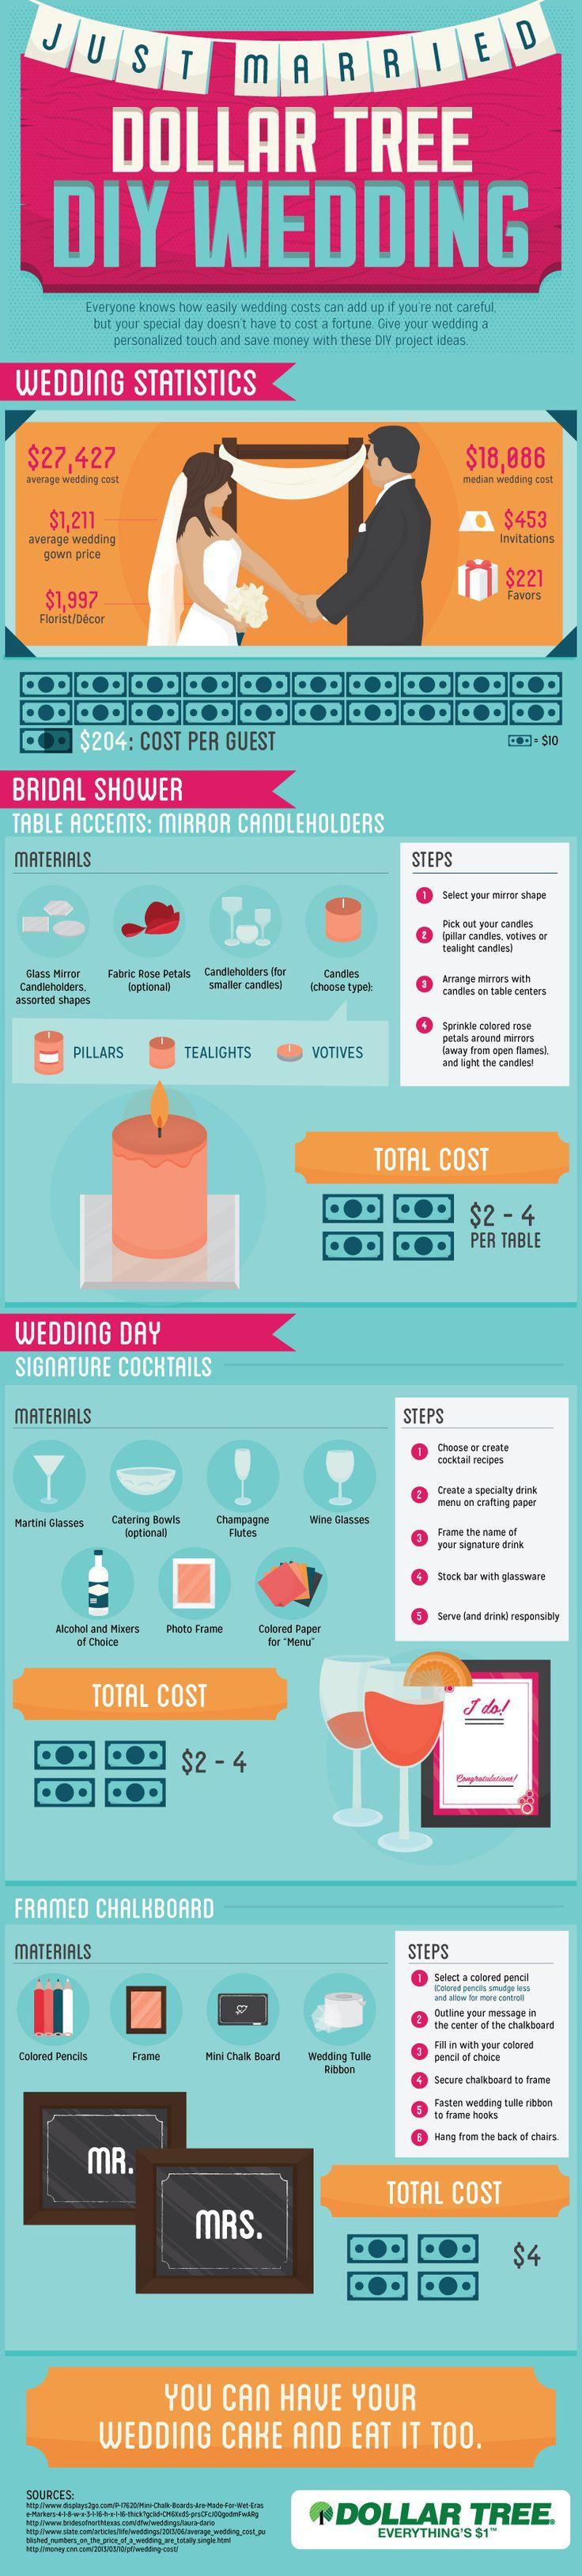 Dollar Tree #DIY #Wedding #infographic